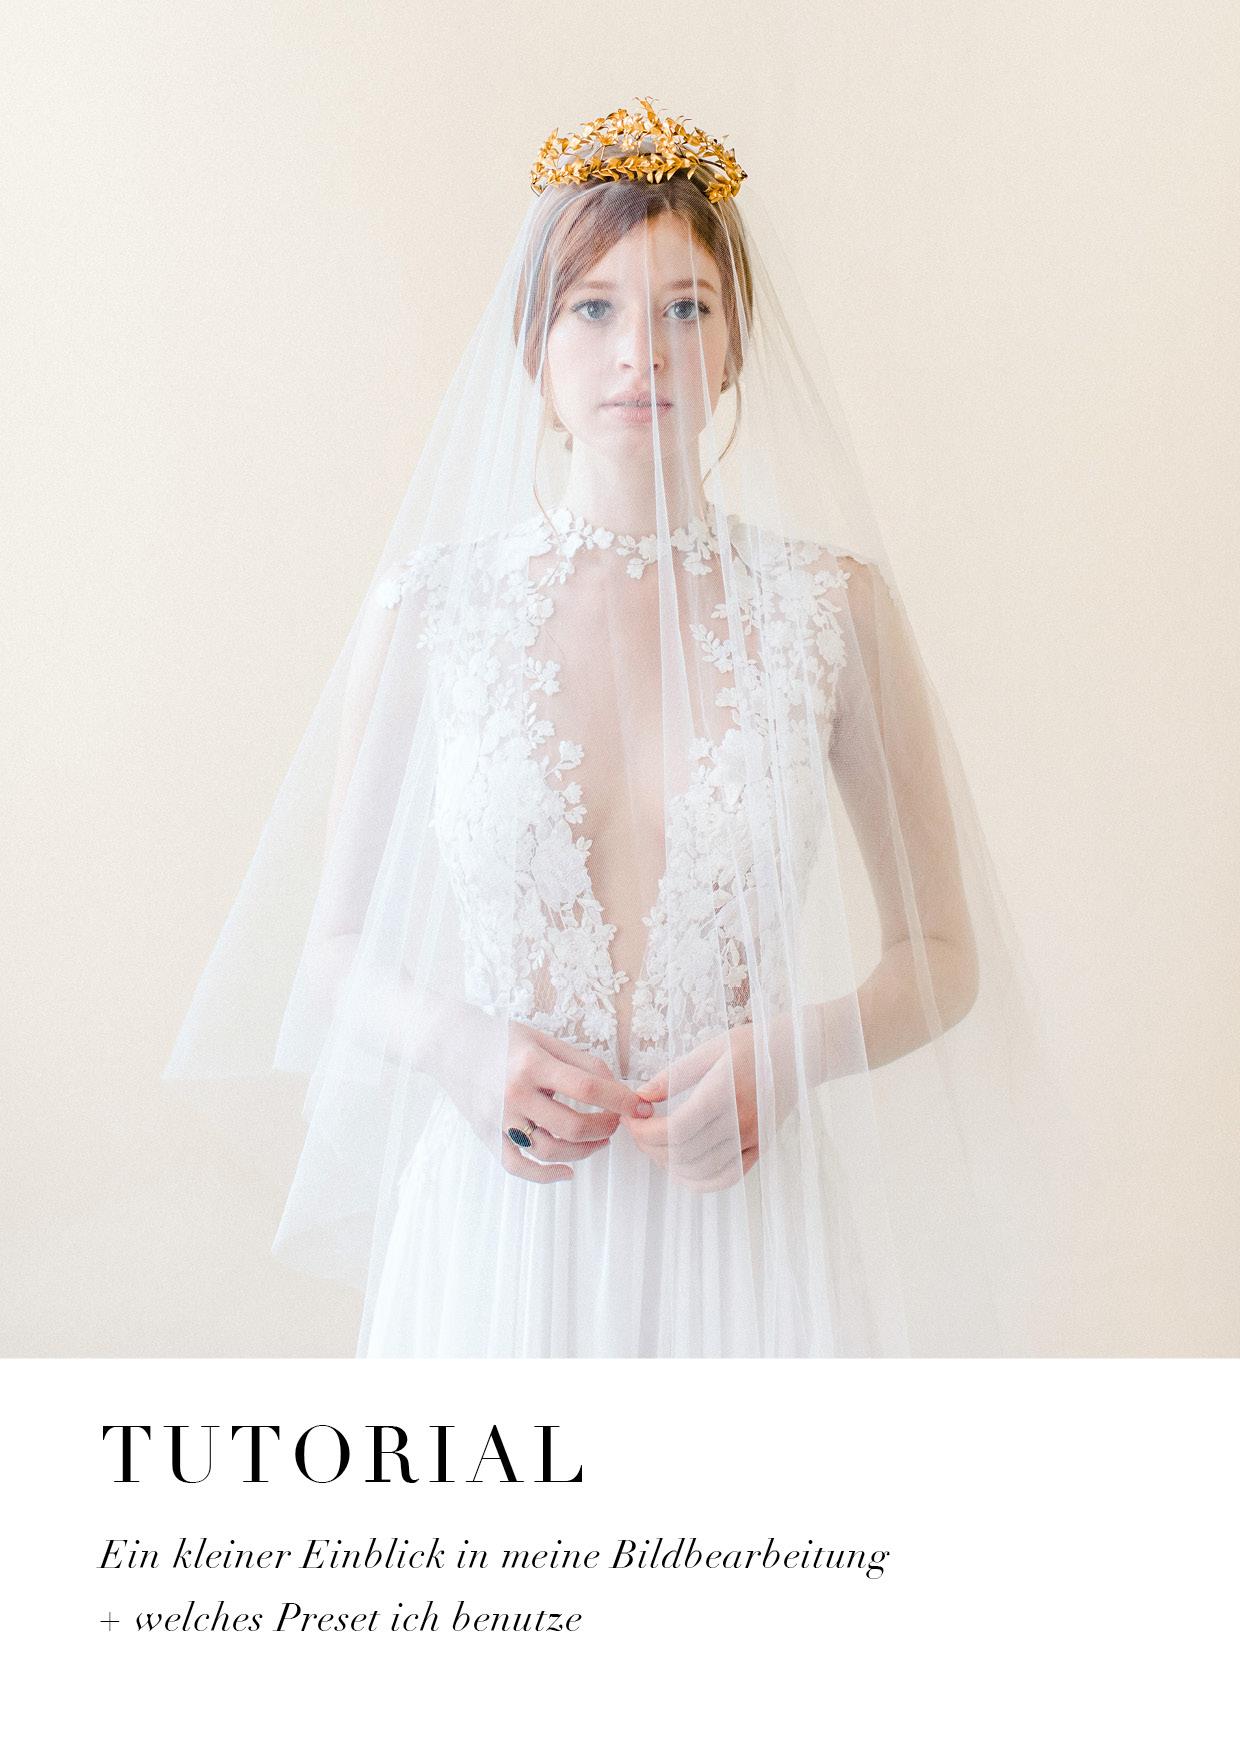 Bildbearbeitung Fine Art Hochzeitsfotografie Preset Lightroom Refined